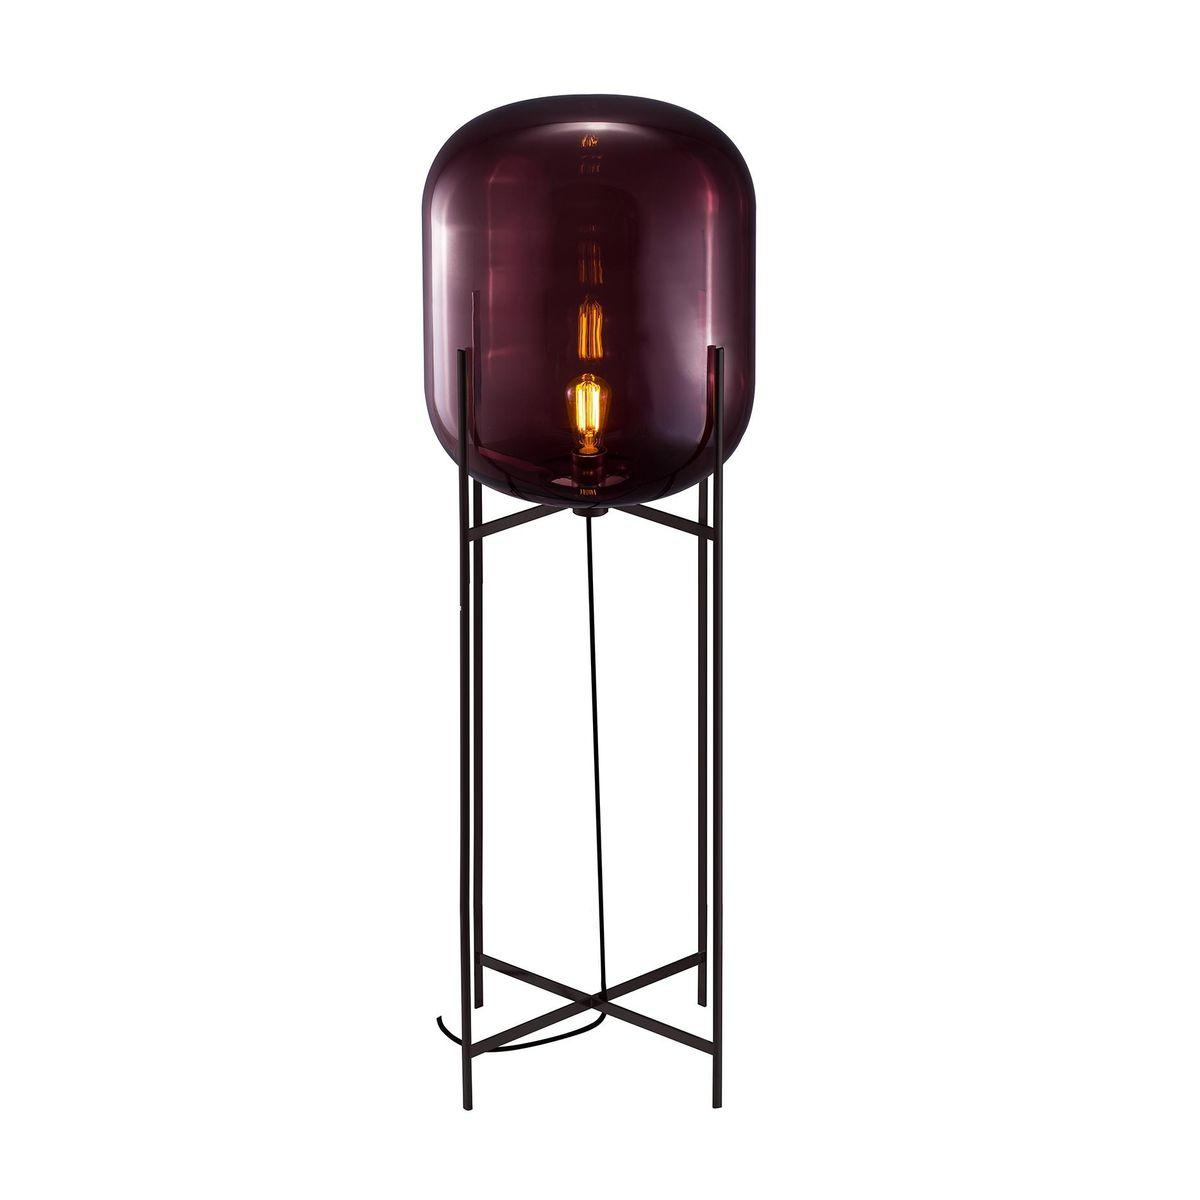 oda big floor lamp h 140cm pulpo. Black Bedroom Furniture Sets. Home Design Ideas